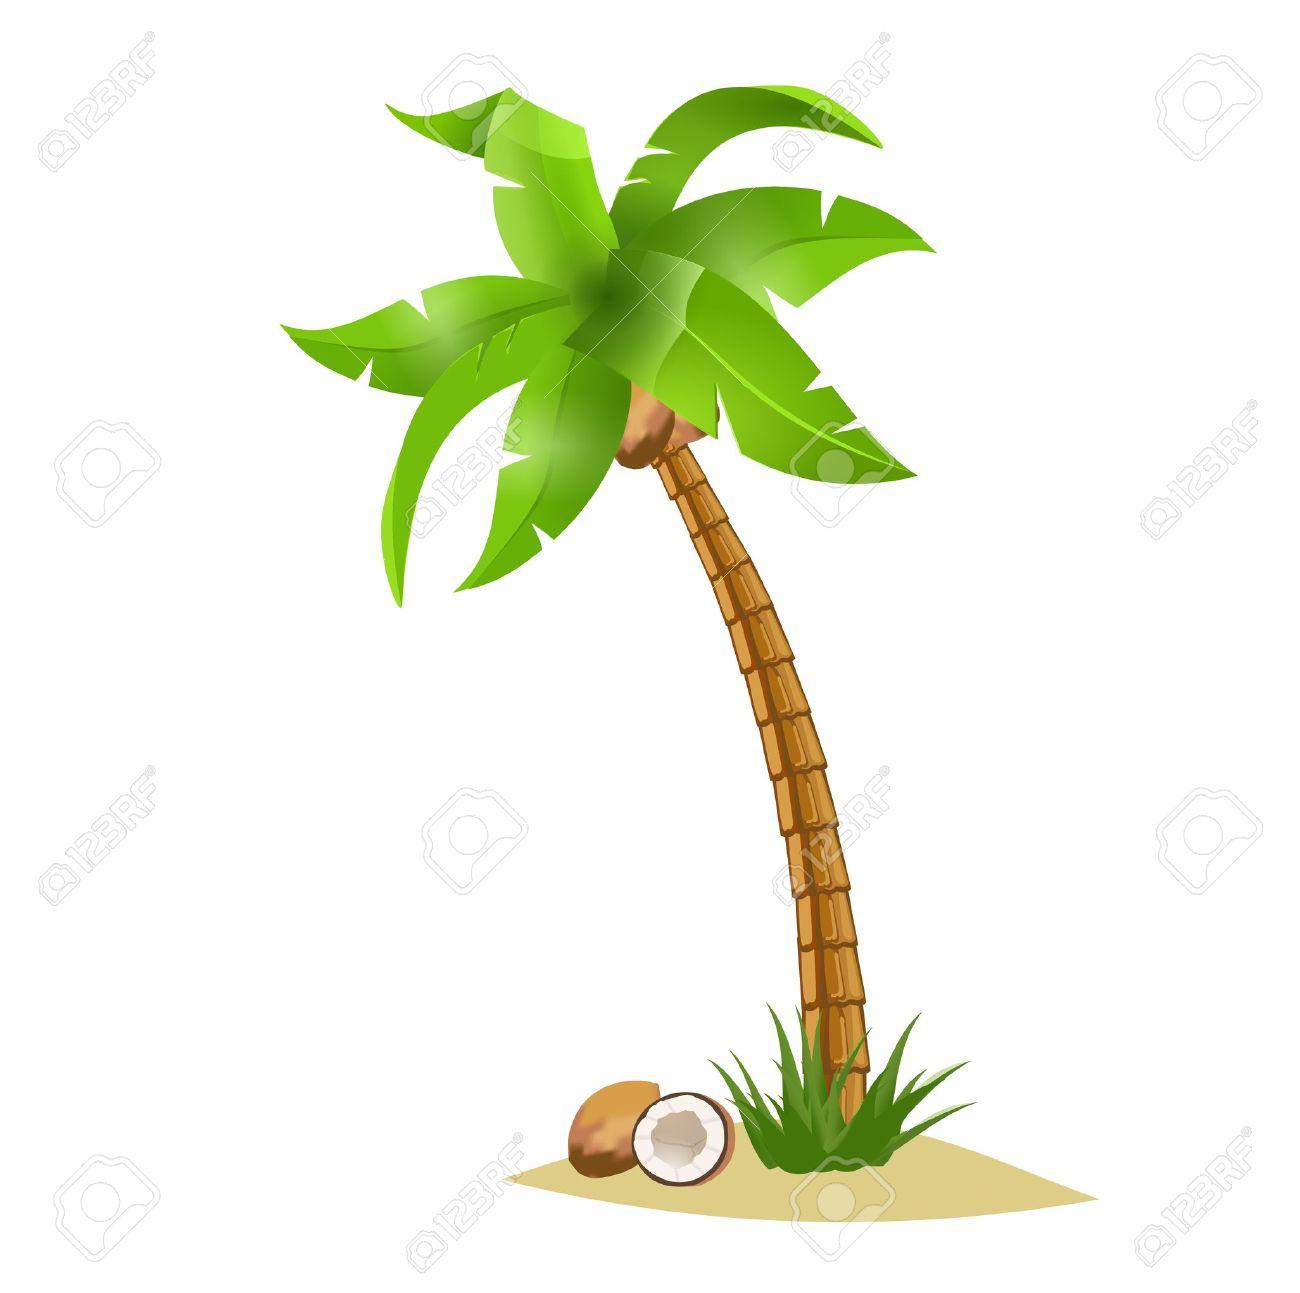 Coconut Palm Tree Clip Art Coconut Tree a Bent Palm